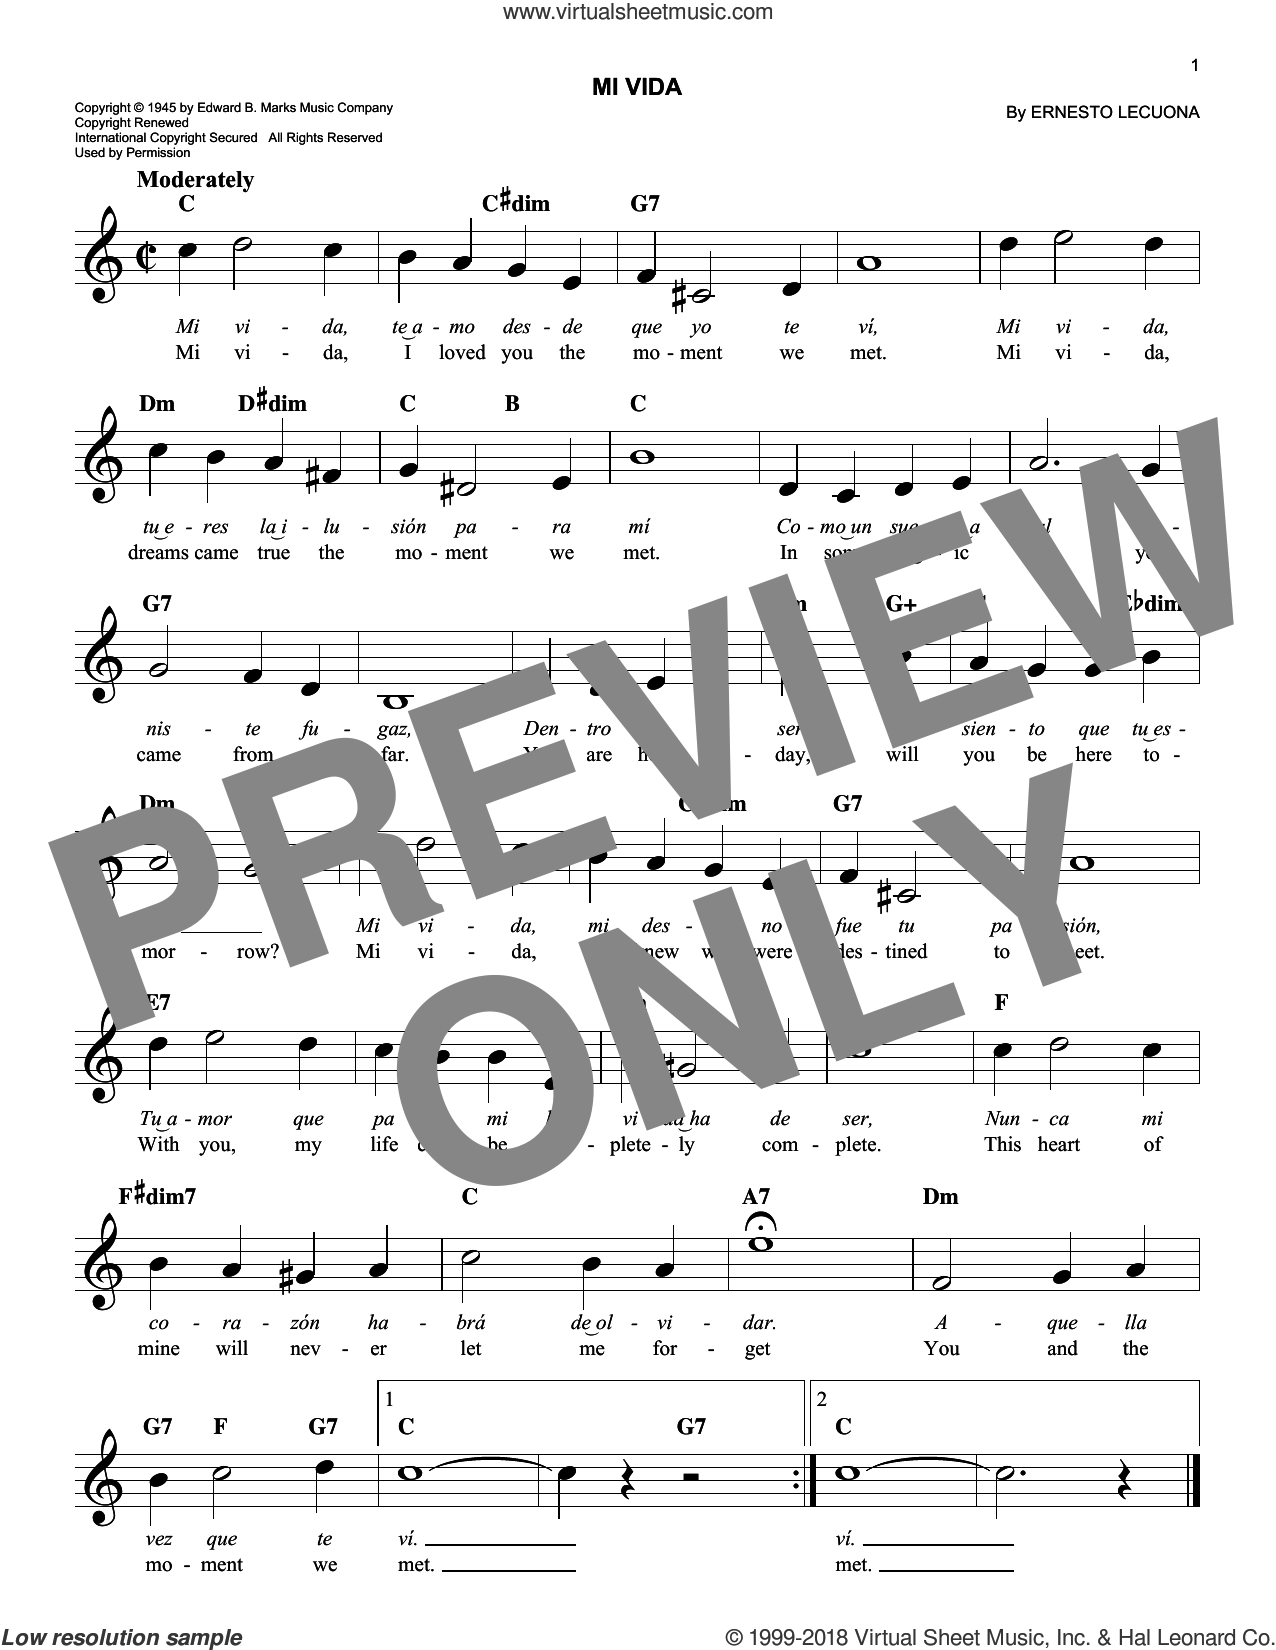 Mi Vida sheet music for voice and other instruments (fake book) by Ernesto Lecuona, intermediate skill level